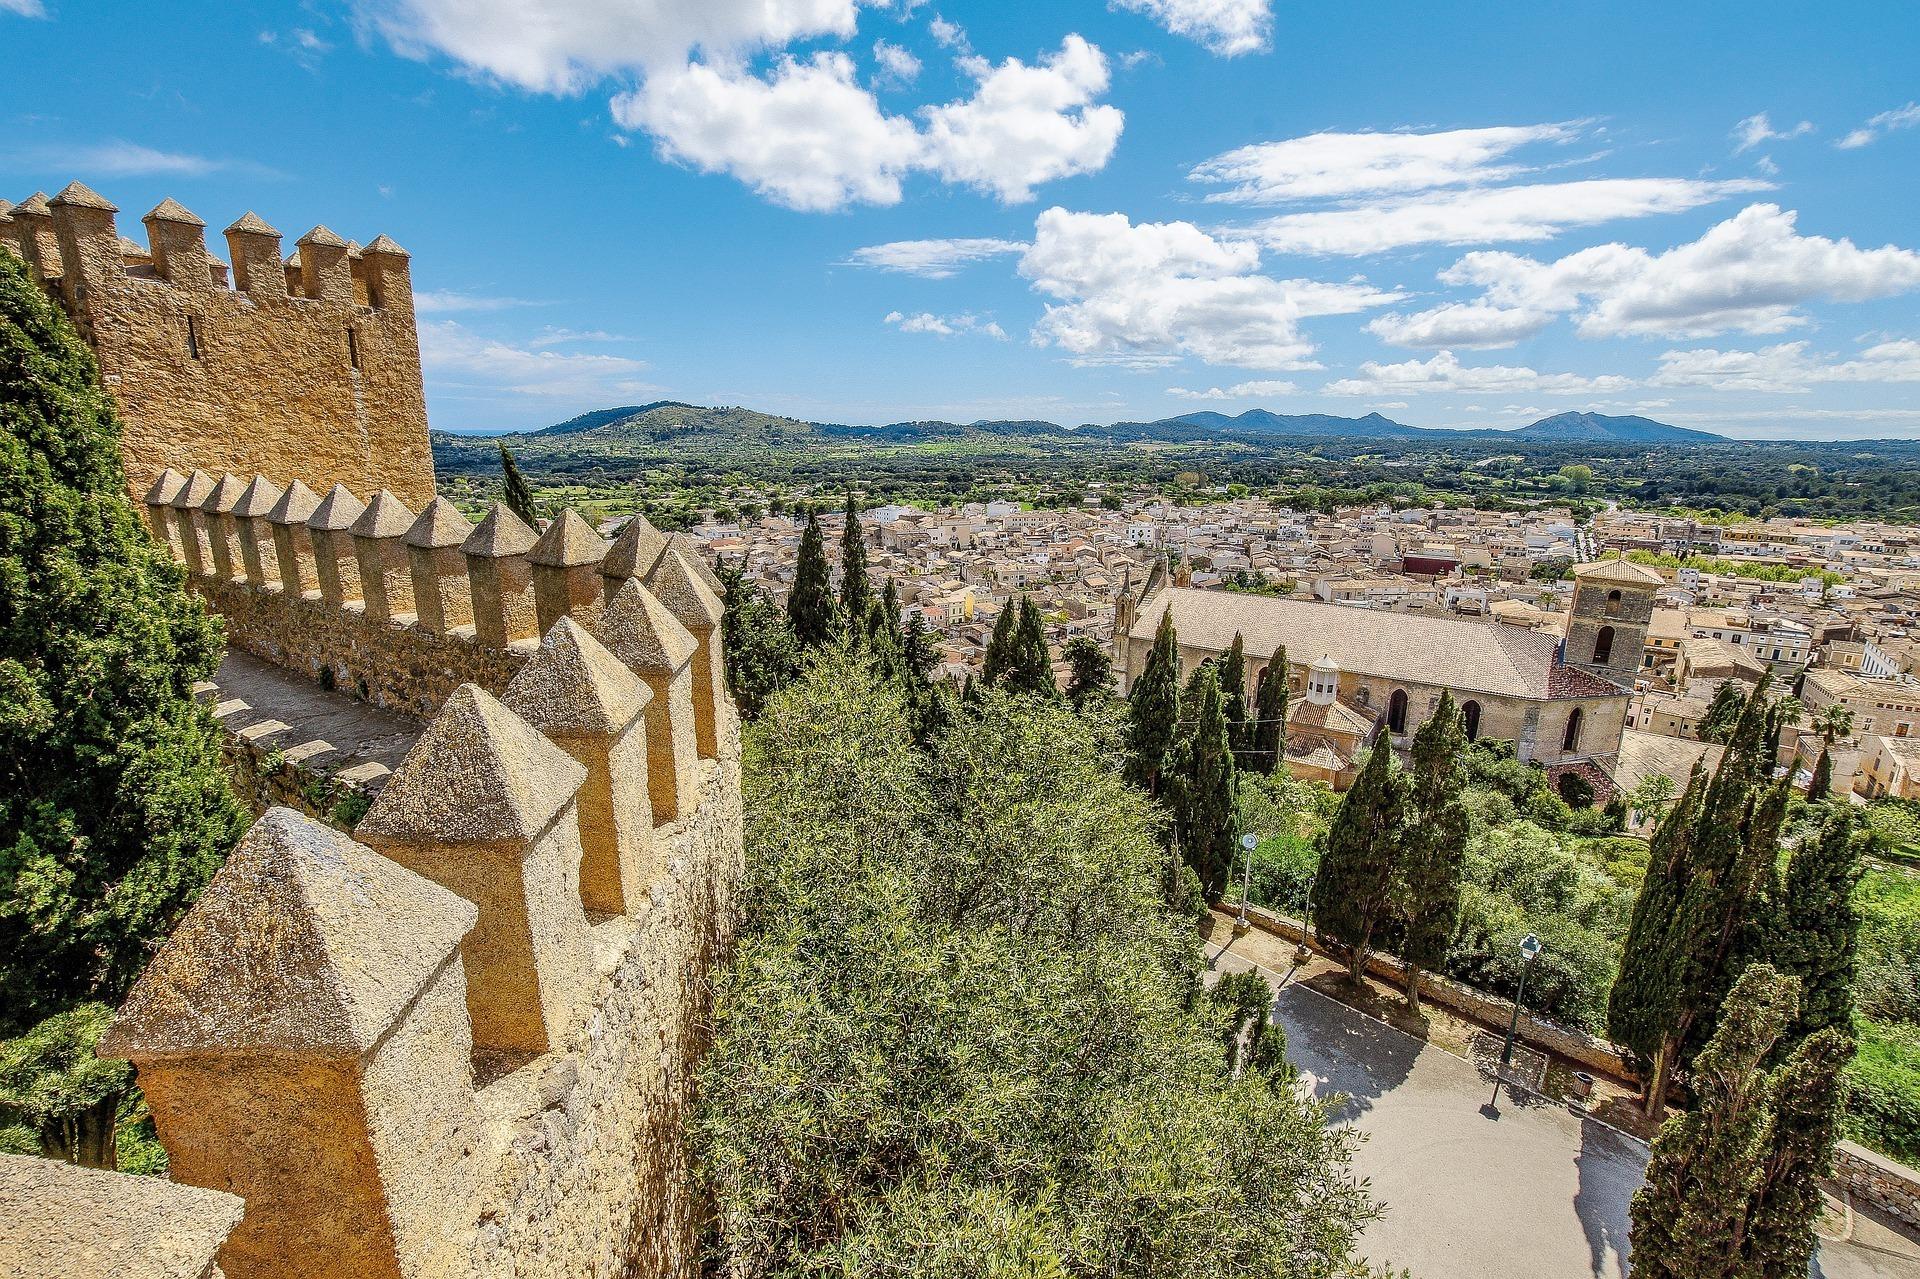 Arta in Mallorca Photo Frank Nurnberger on Pixabay